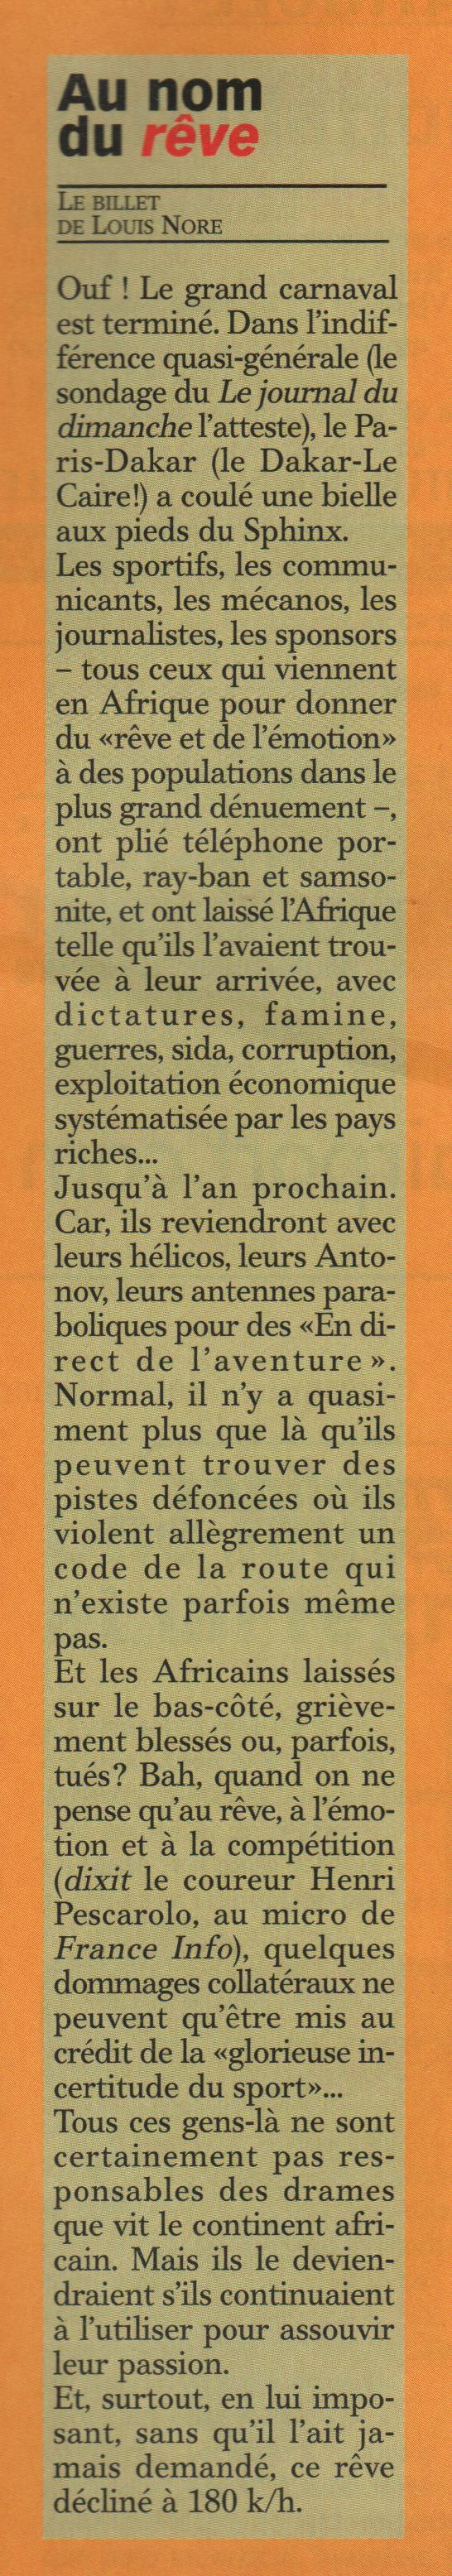 2 - Février 2000 1 001.jpg